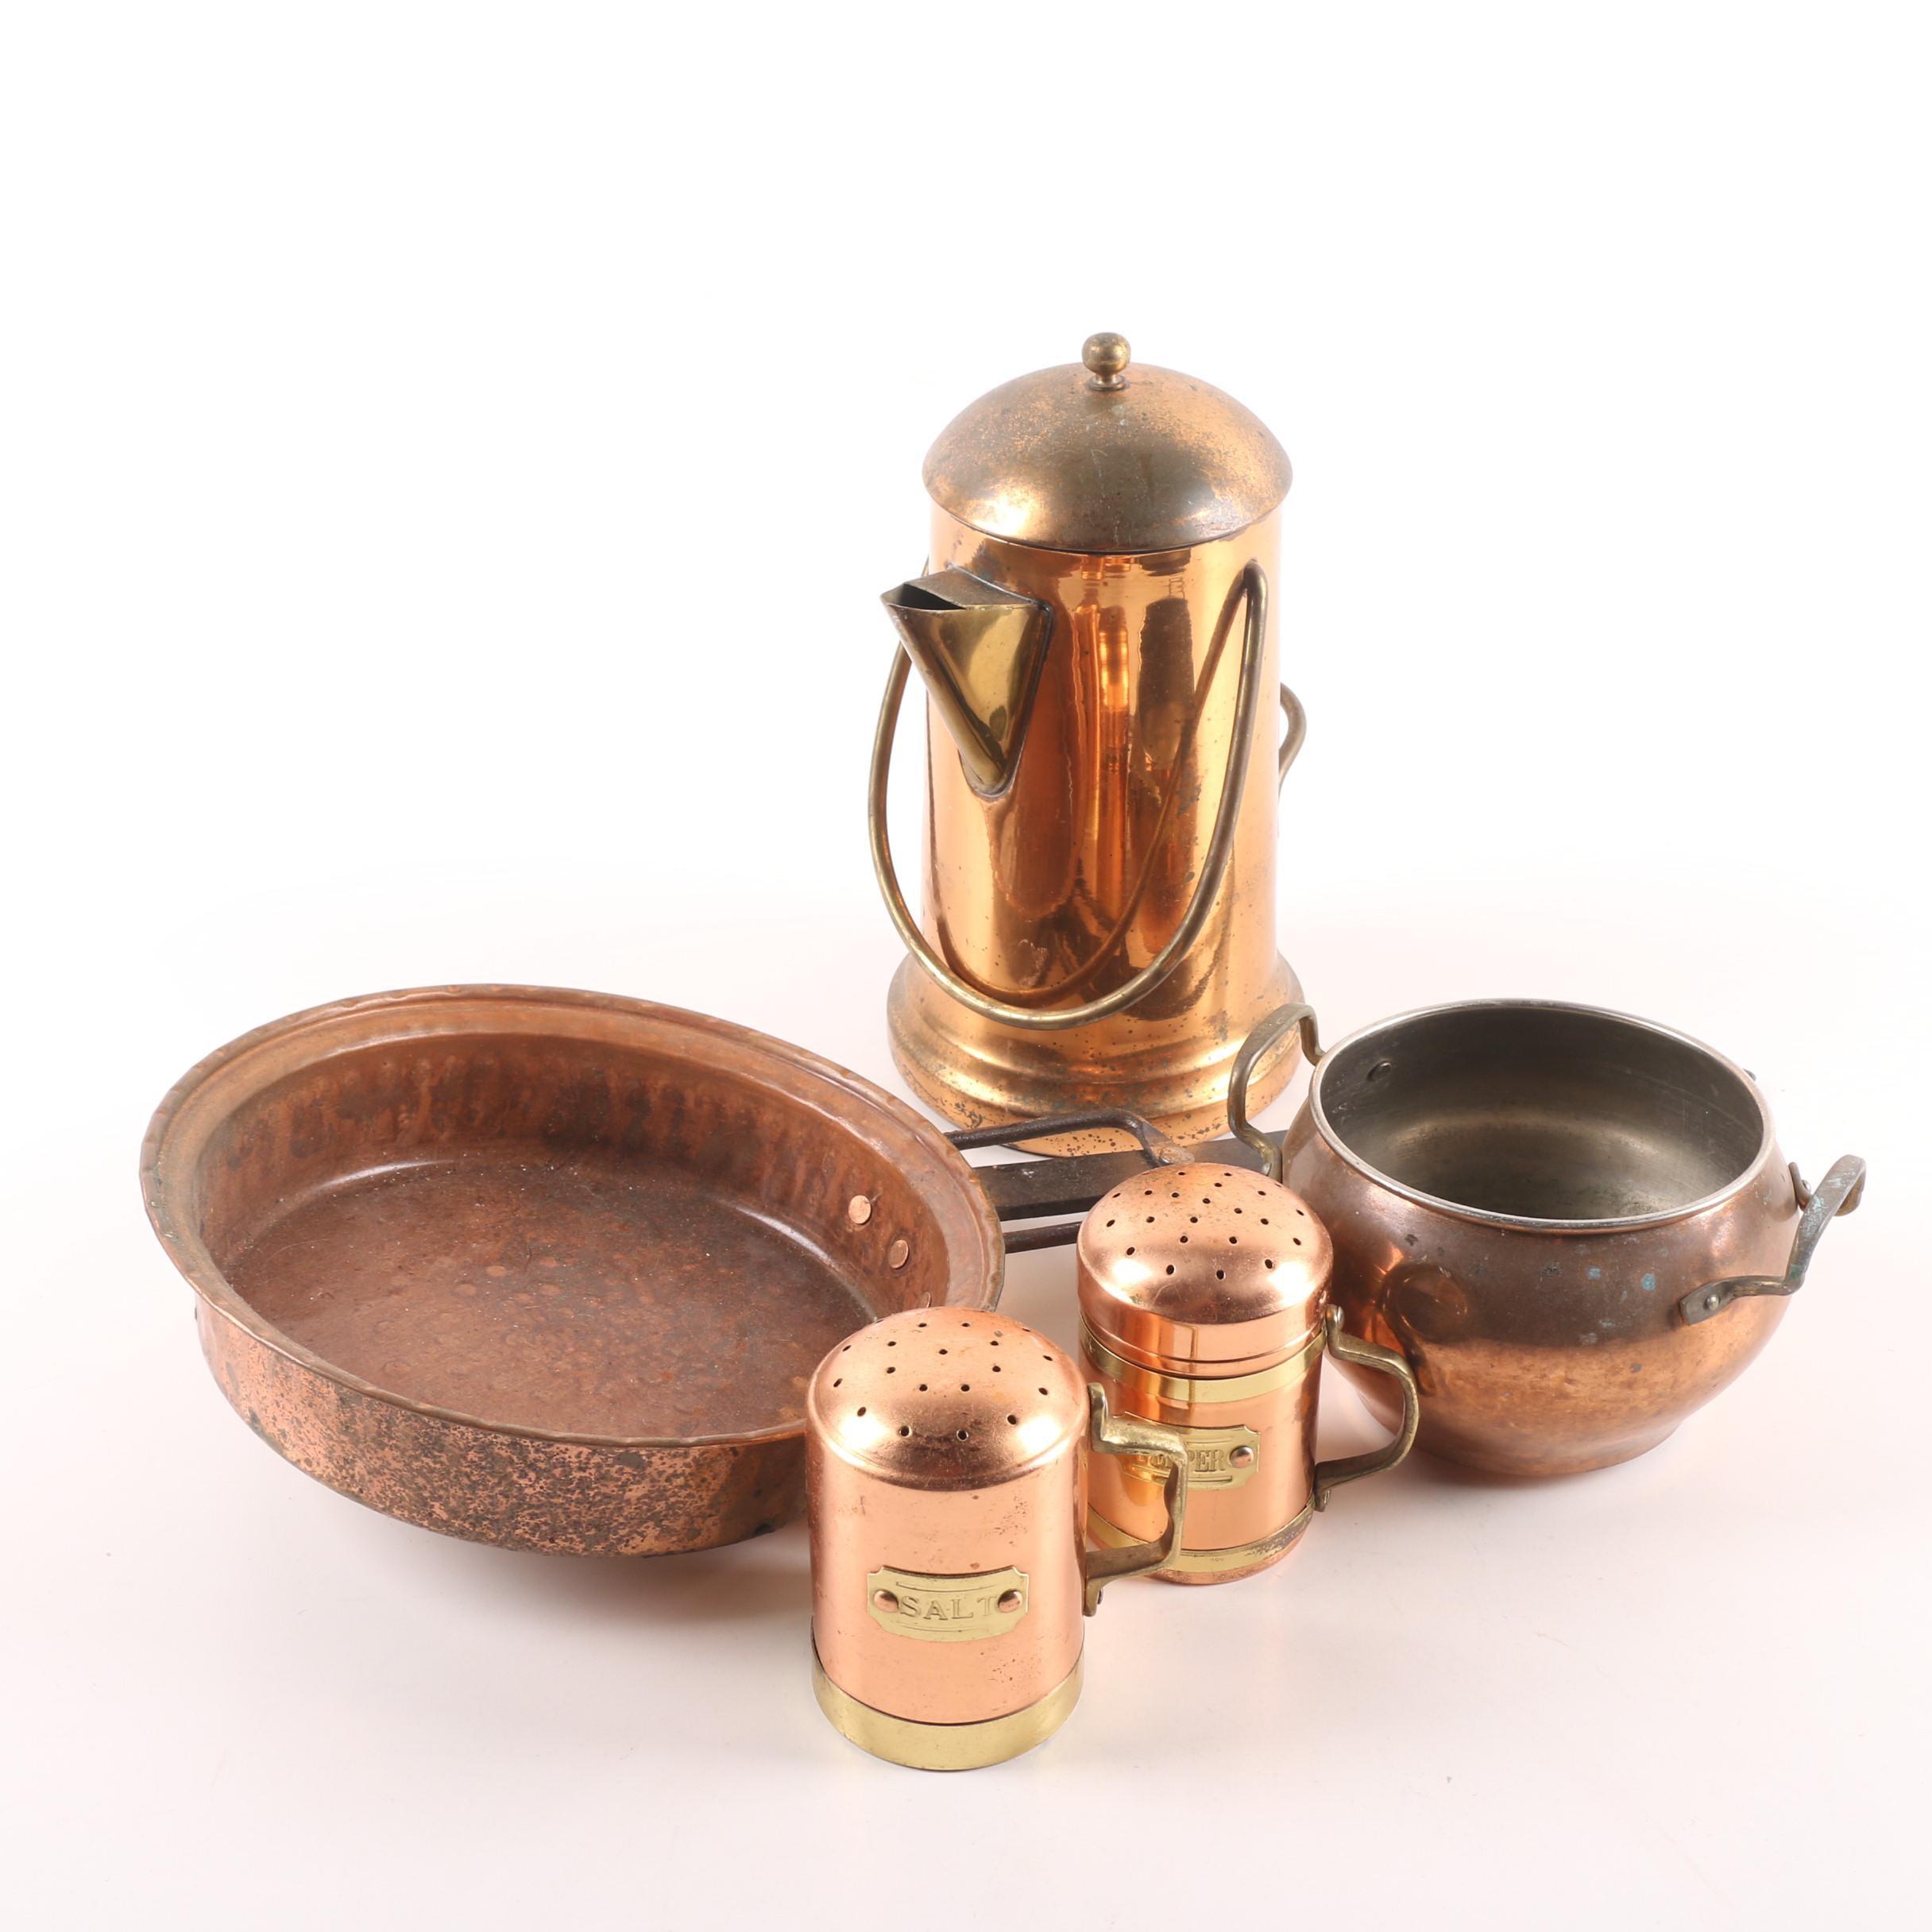 Vintage Copper Serveware